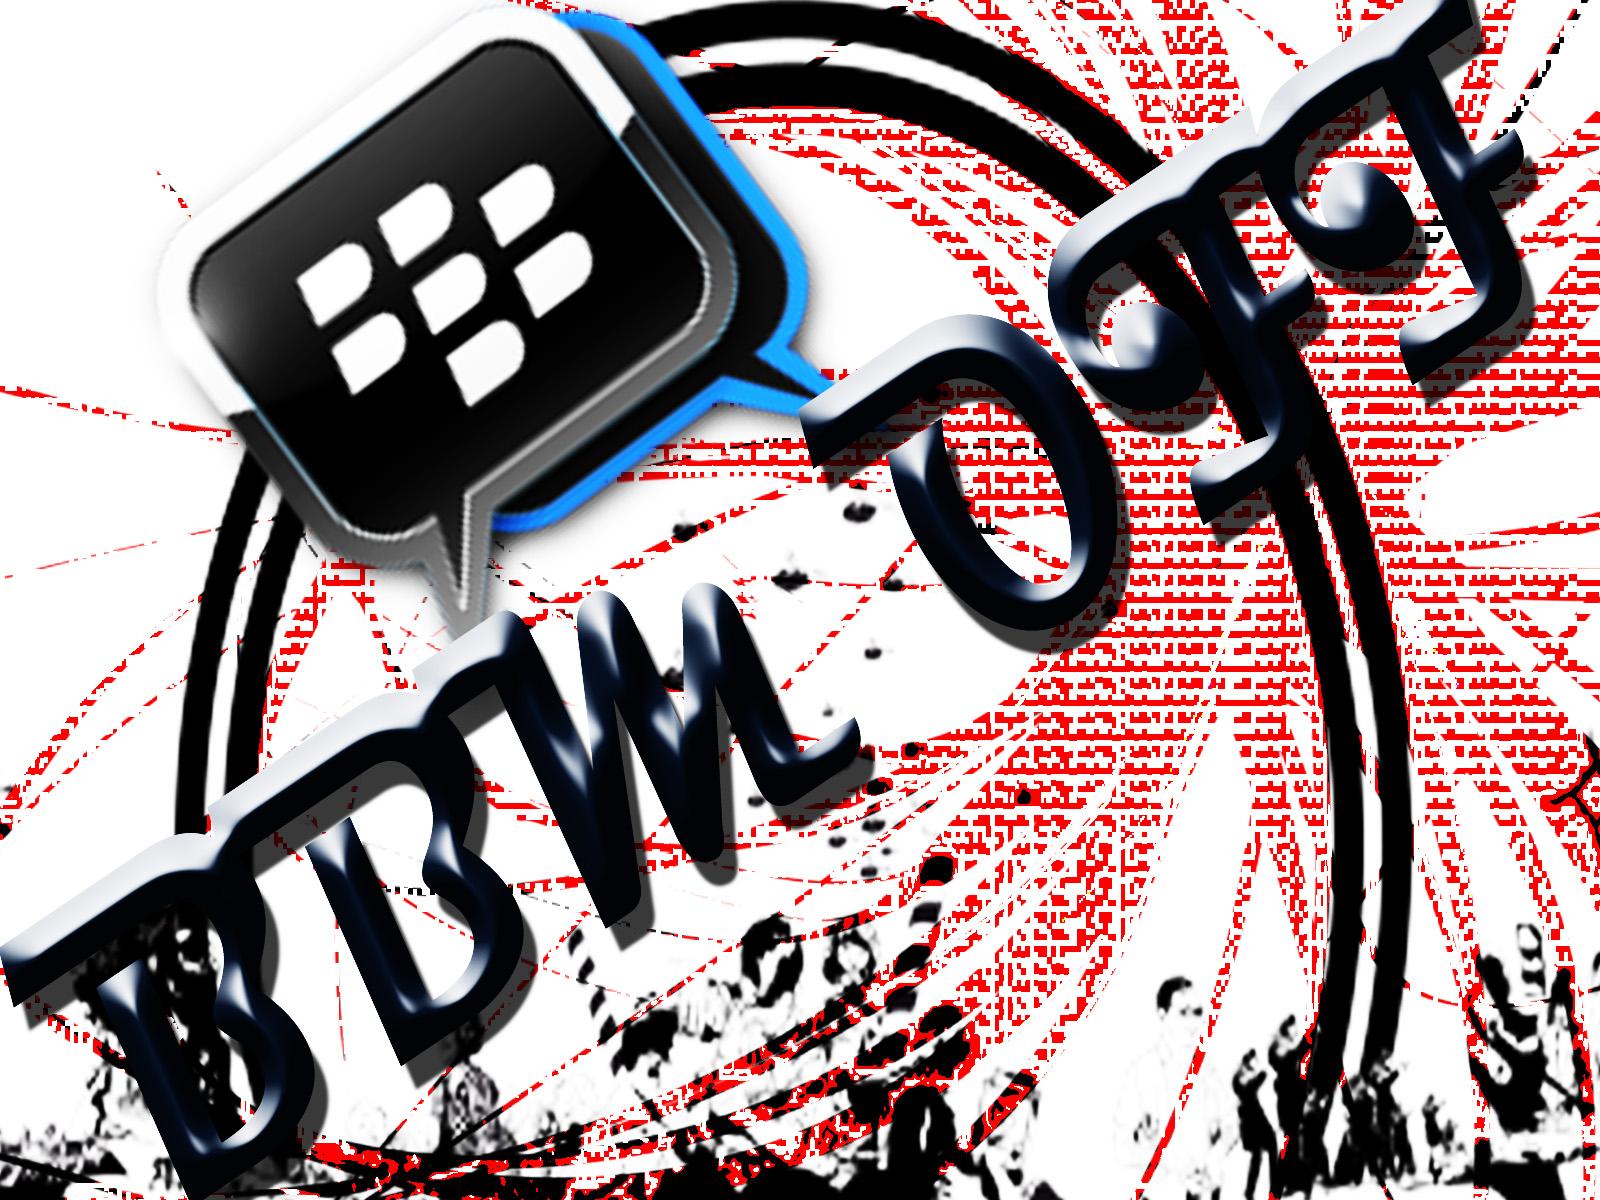 http://1.bp.blogspot.com/-9ObXA0CQTm4/TtOeLq1FaMI/AAAAAAAAA4w/XNv2Ng2Va-Q/s1600/bbm_off_blackberry_Picture-by_banditajj4wallpaperart.jpg